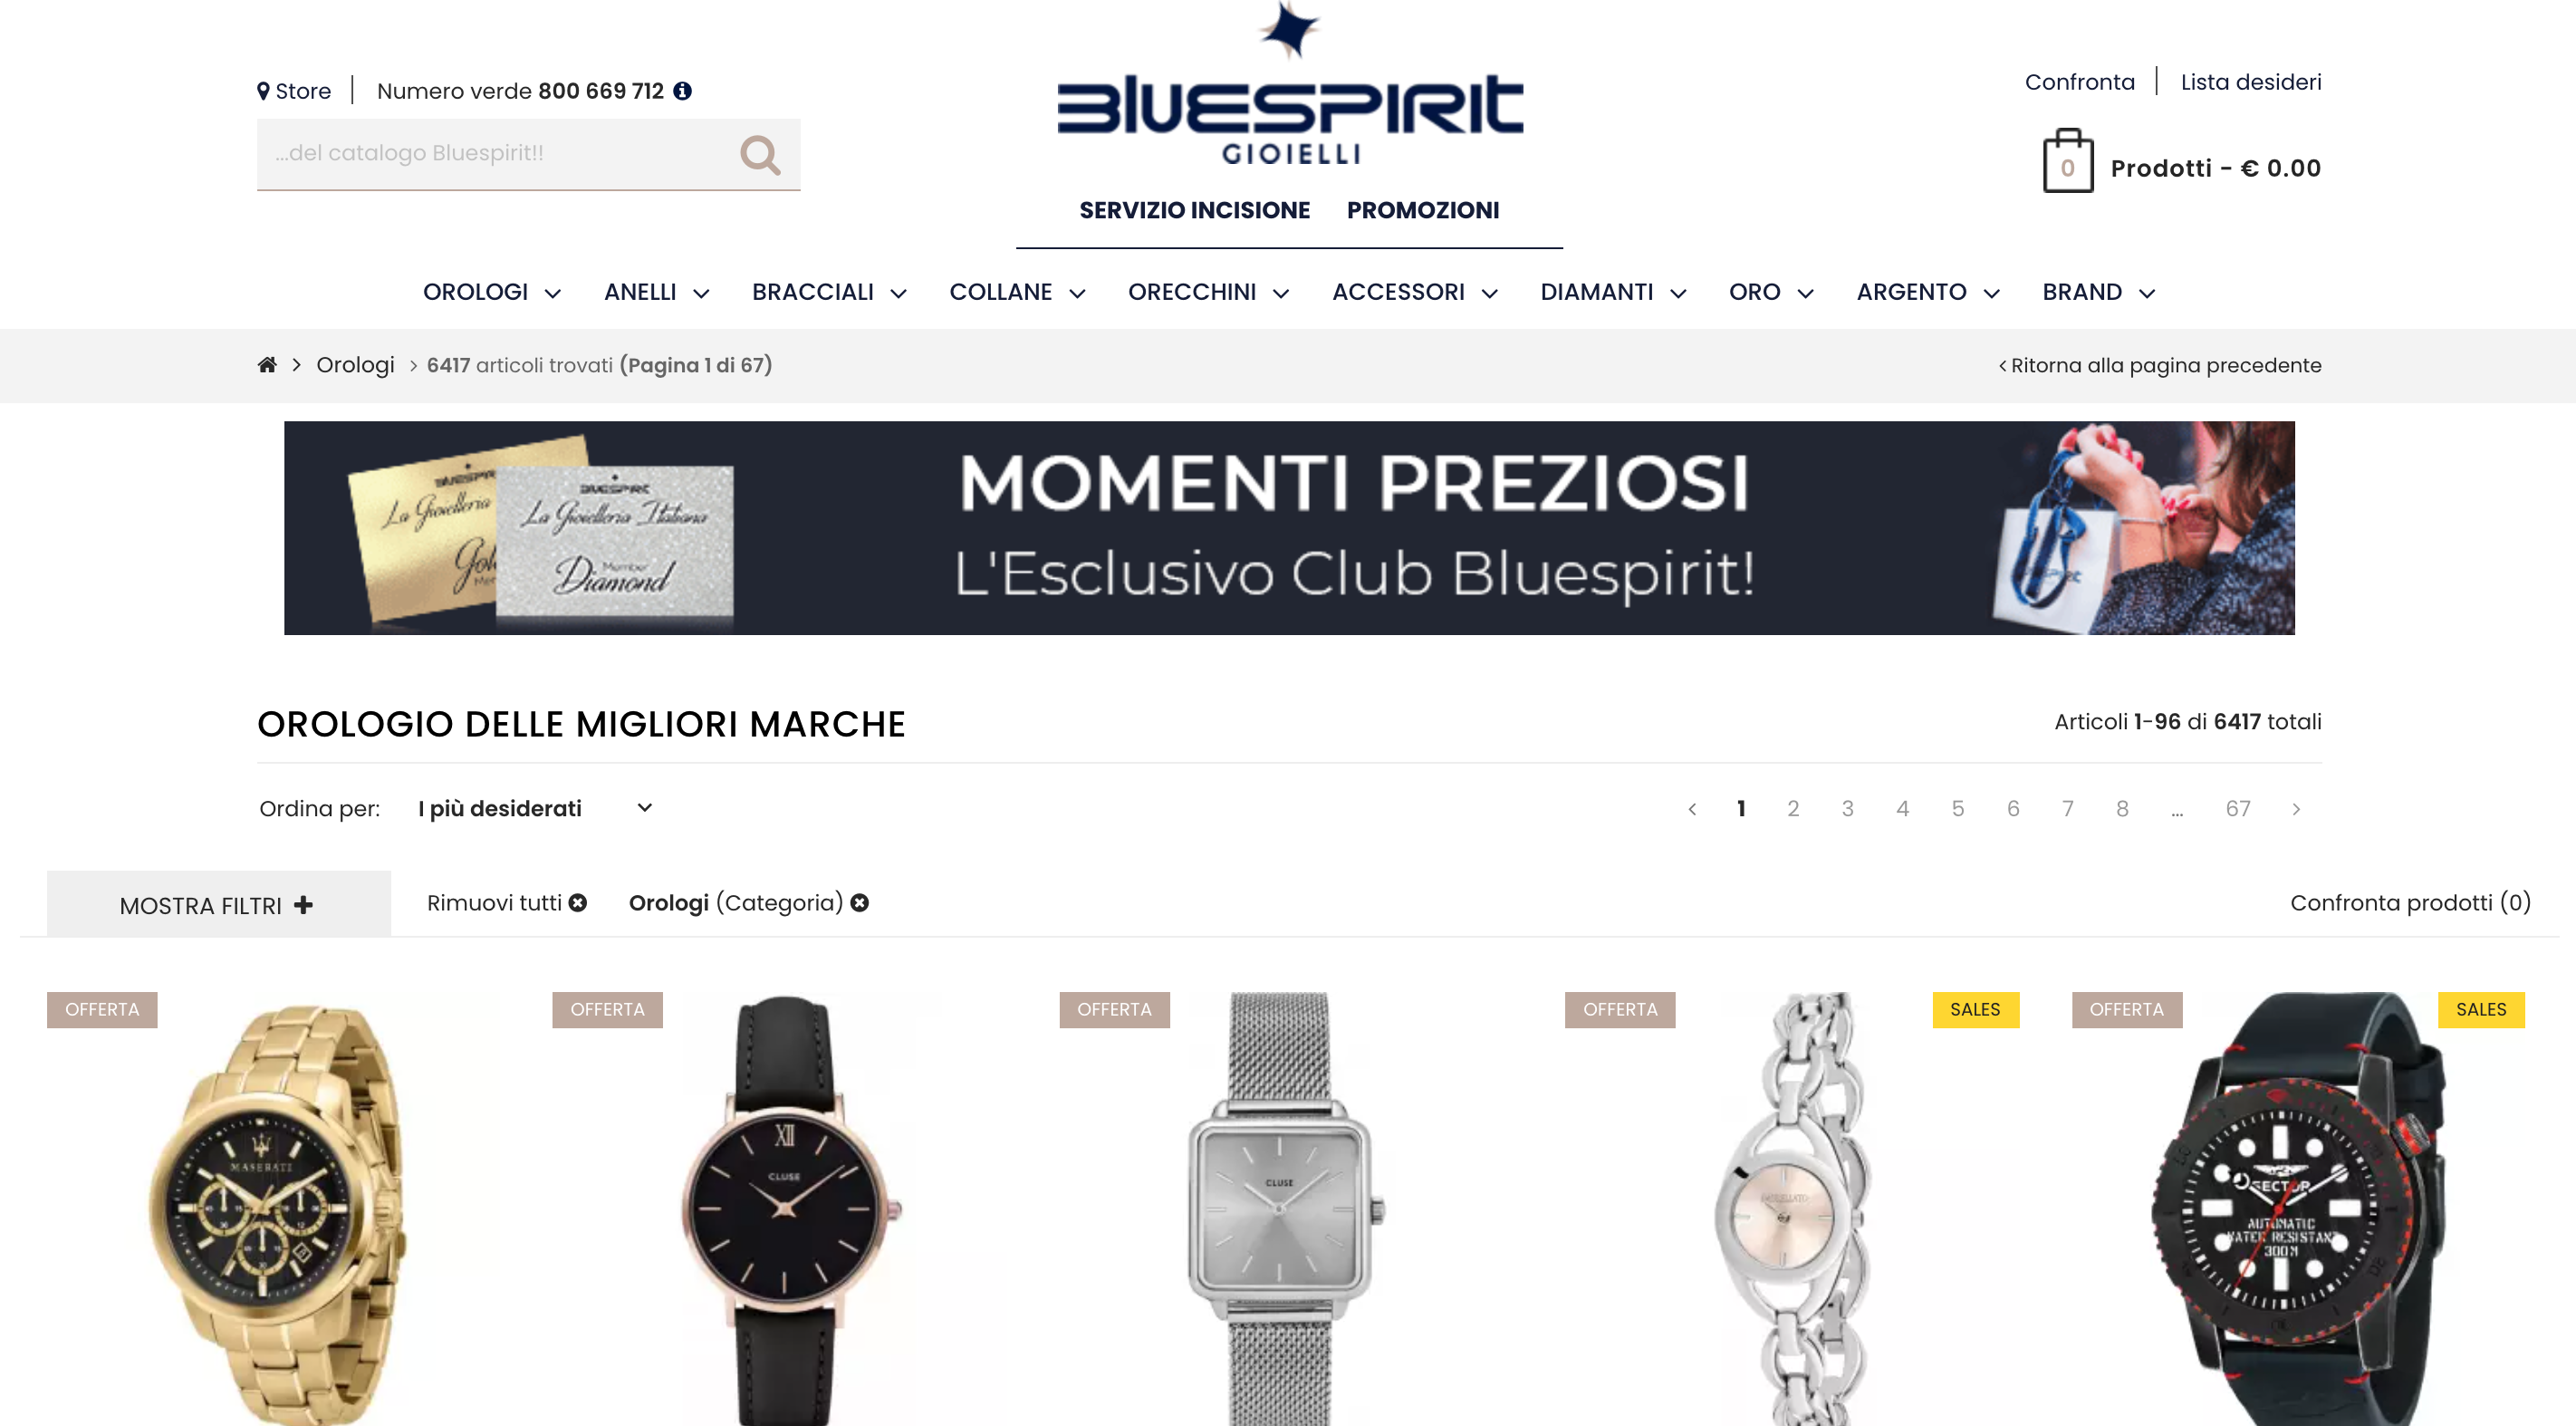 Bluespirit orologi uomo e donna online